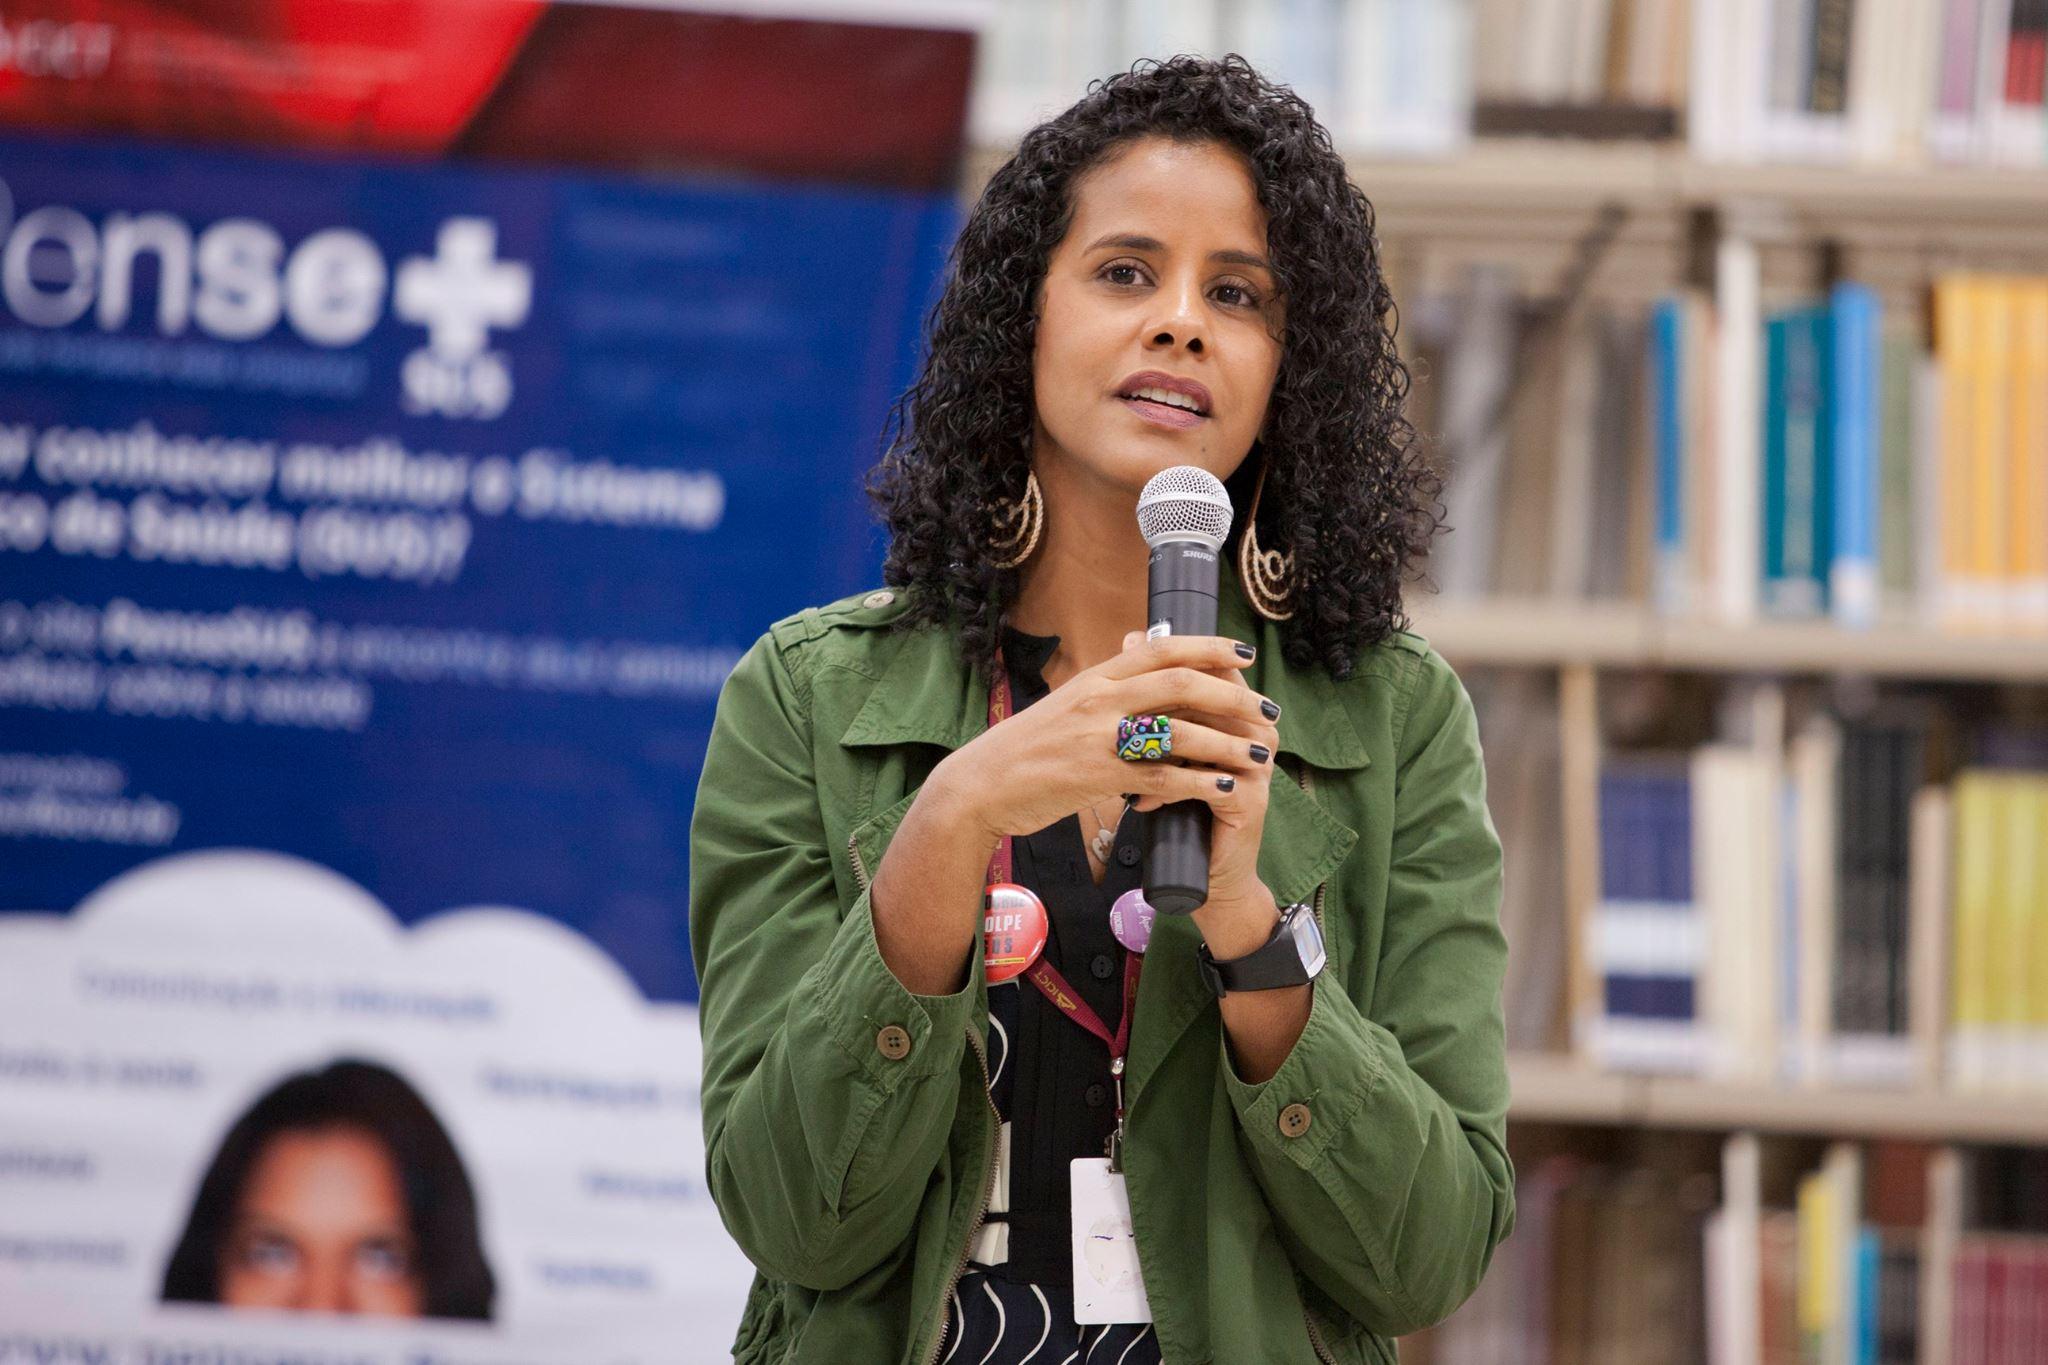 Marina Maria, editora do PenseSUS